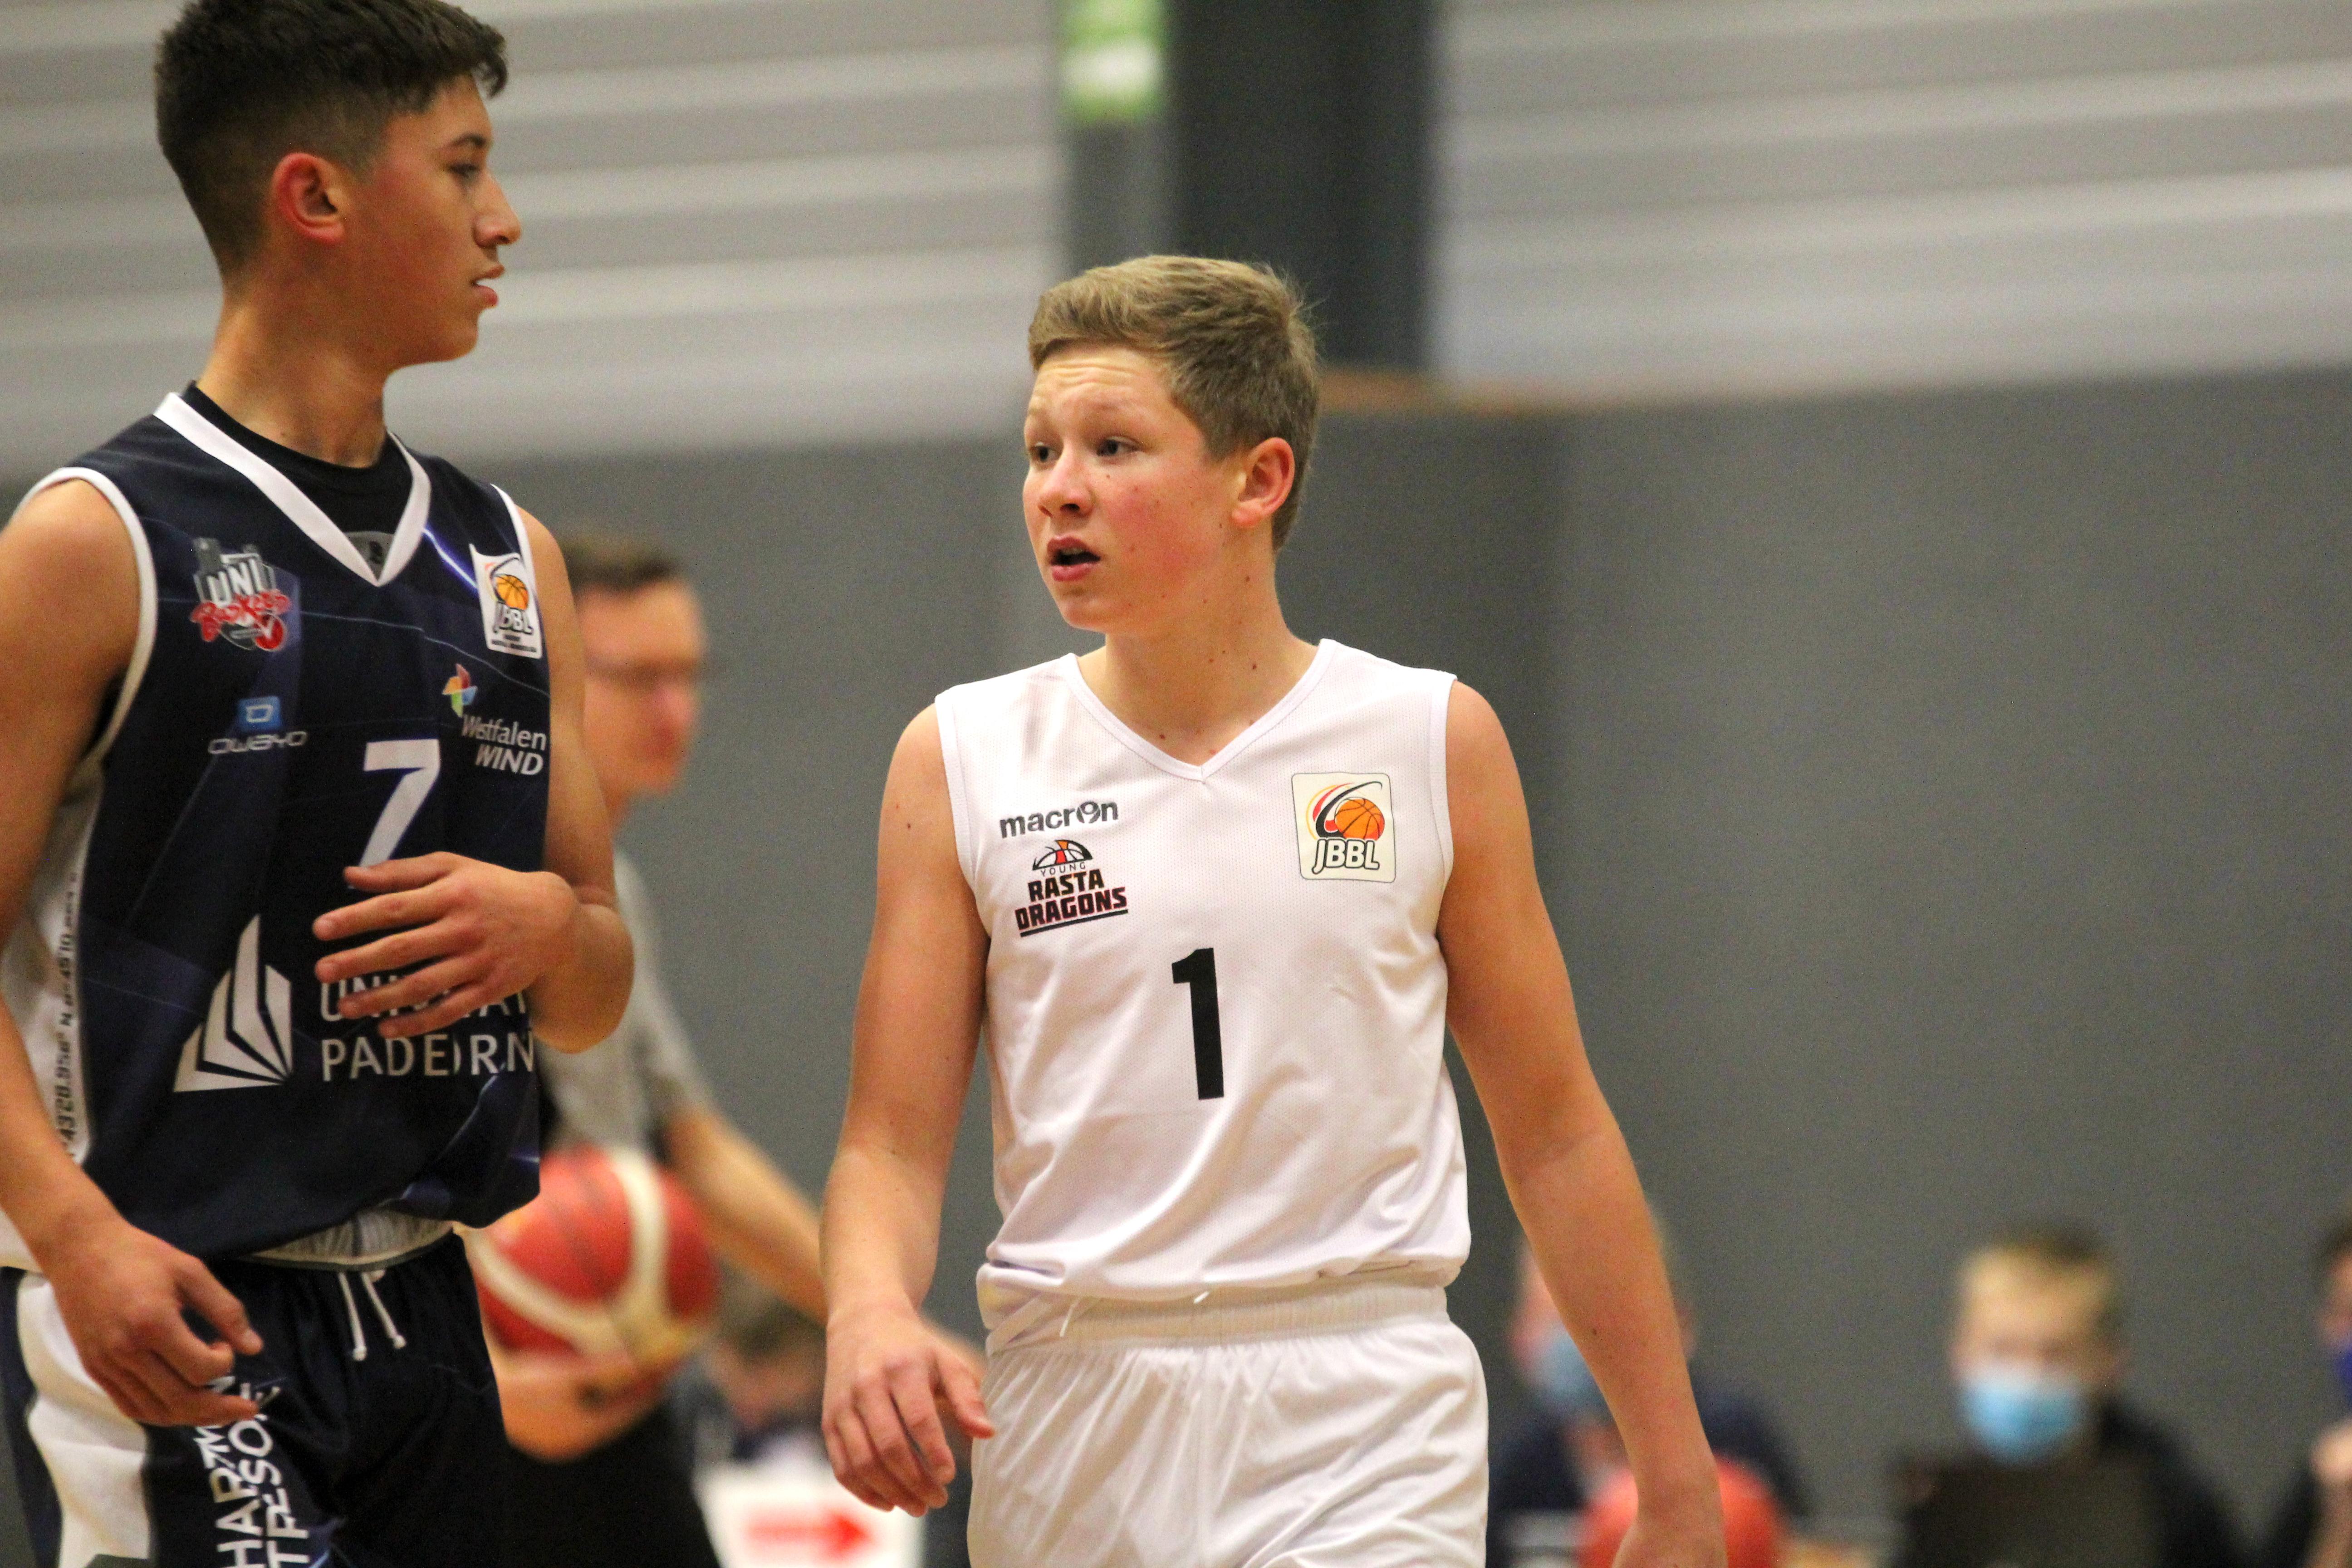 JBBL_20-21_YOUNG-RASTA-DRAGONS_Paderborn_Spieltag2_Michel-Schillmoeller